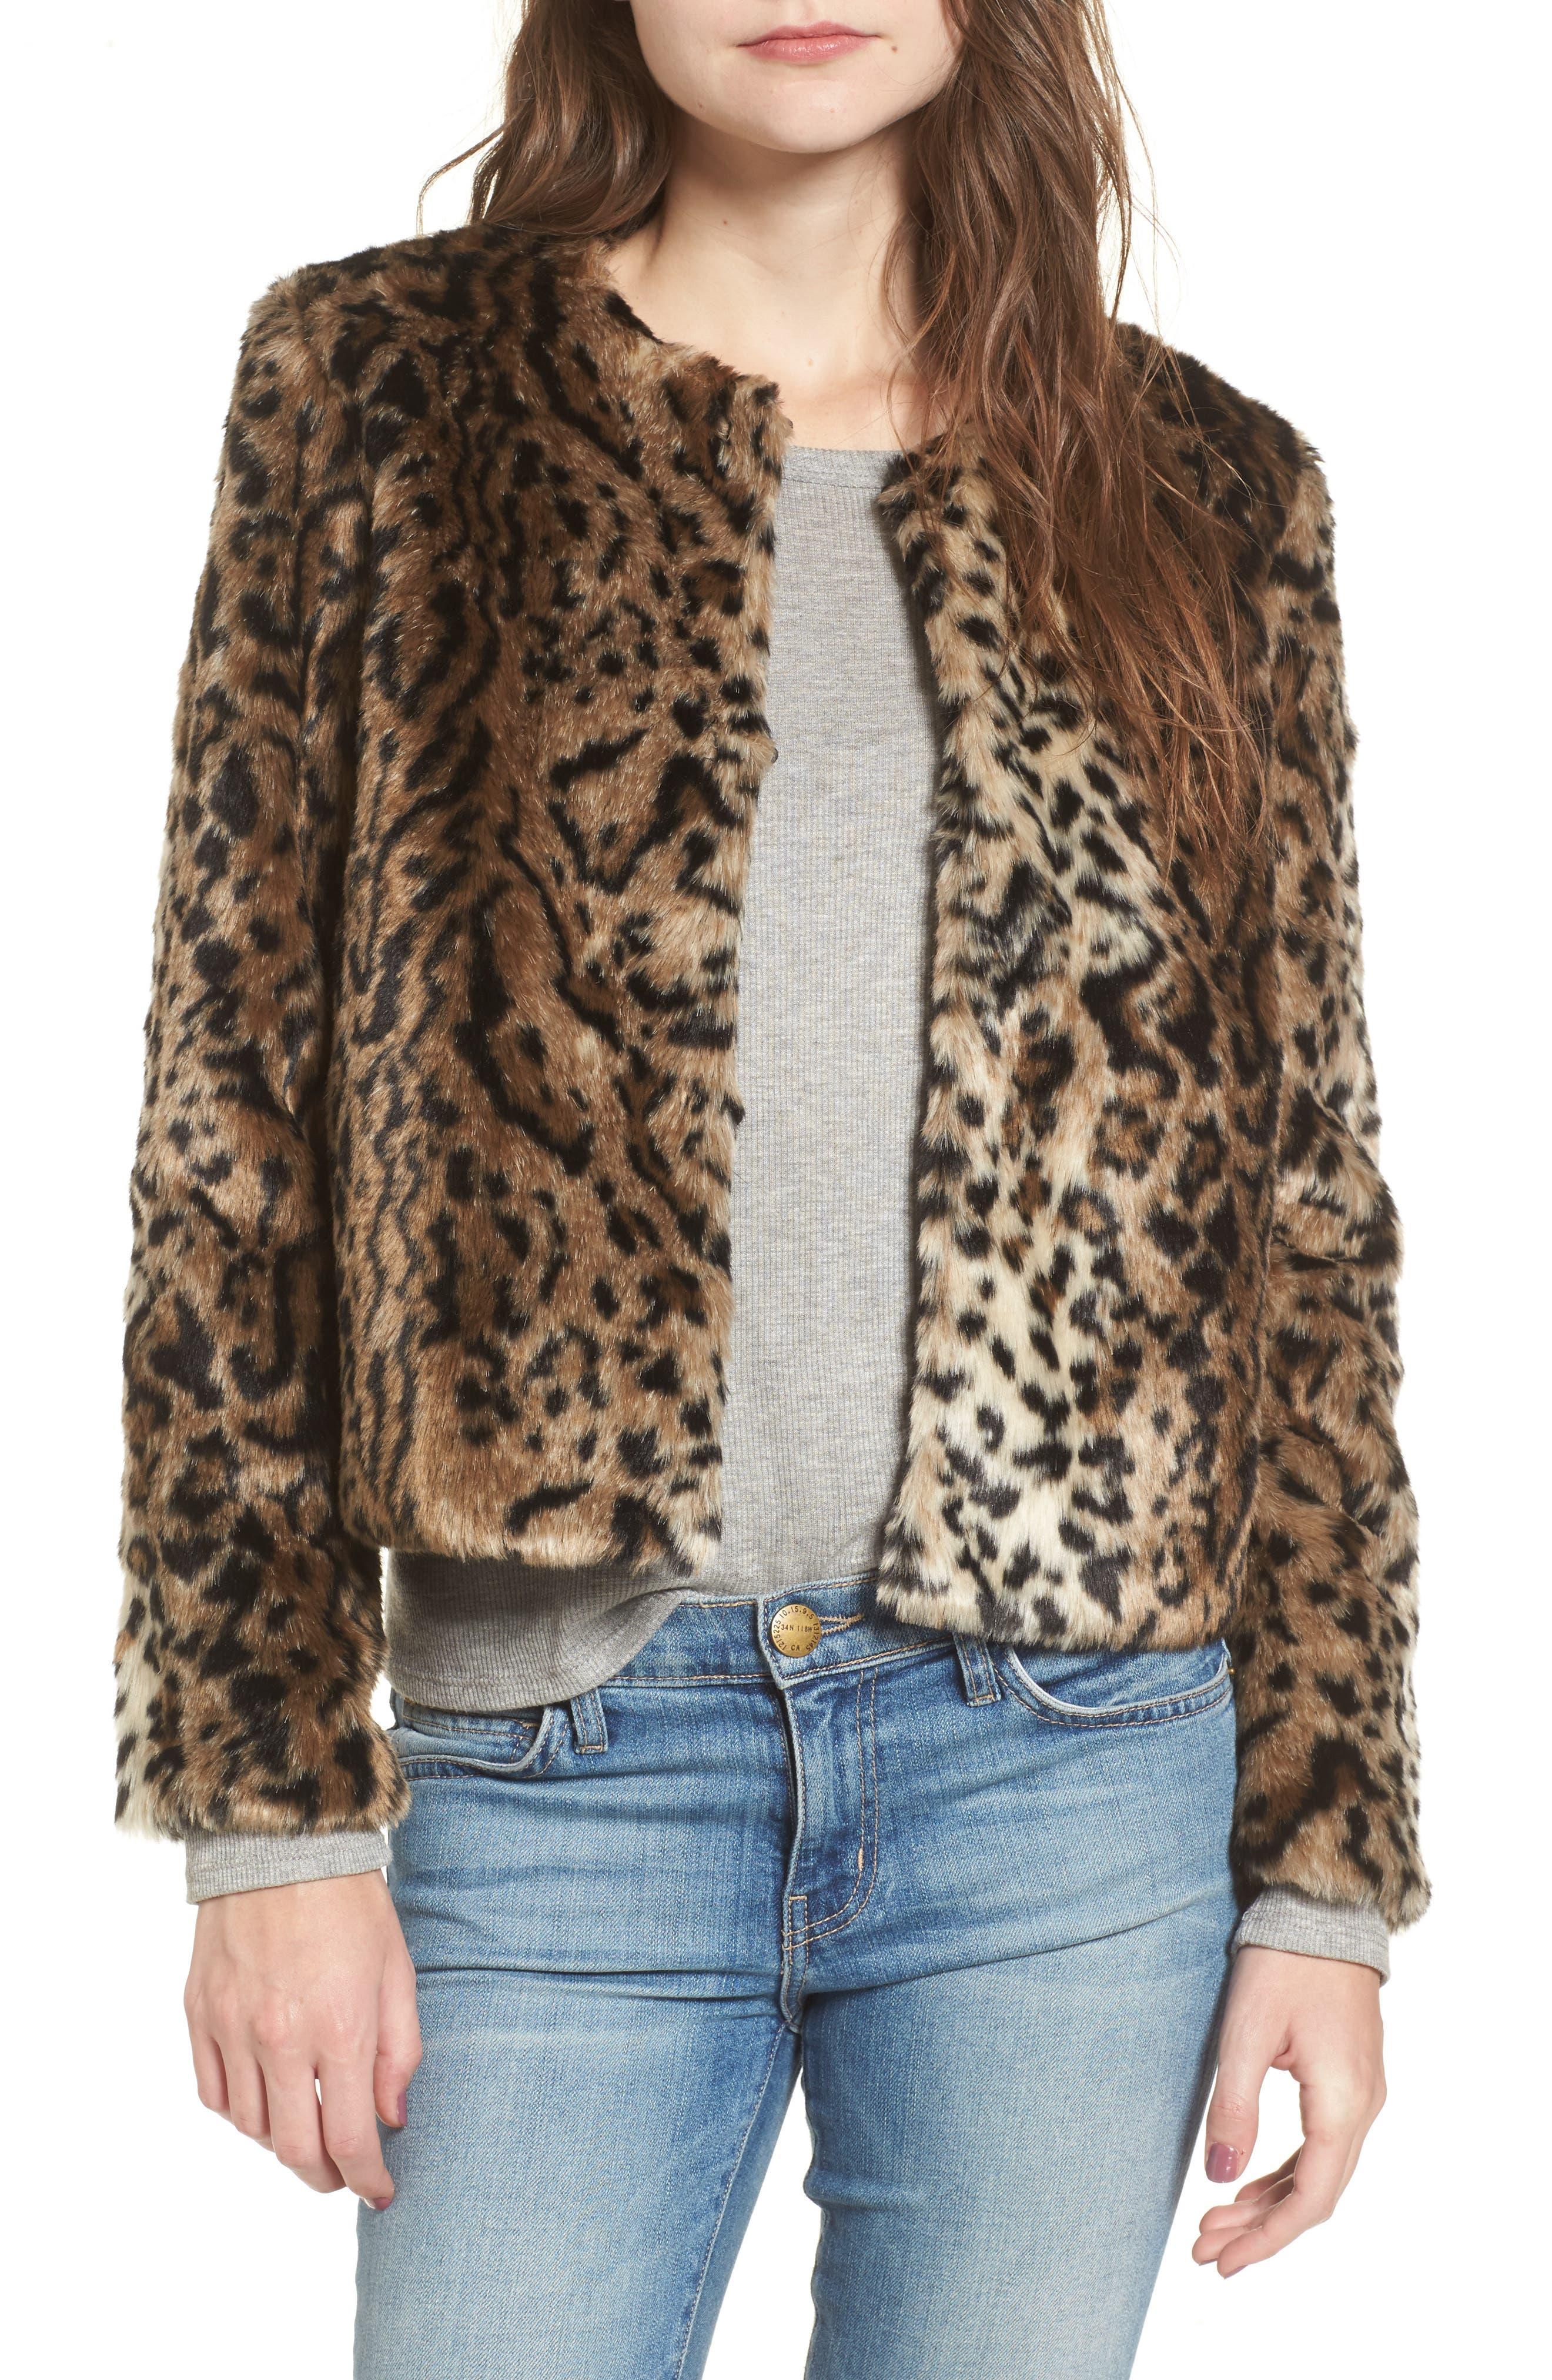 BB Dakota McKinley Leopard Print Faux Fur Jacket